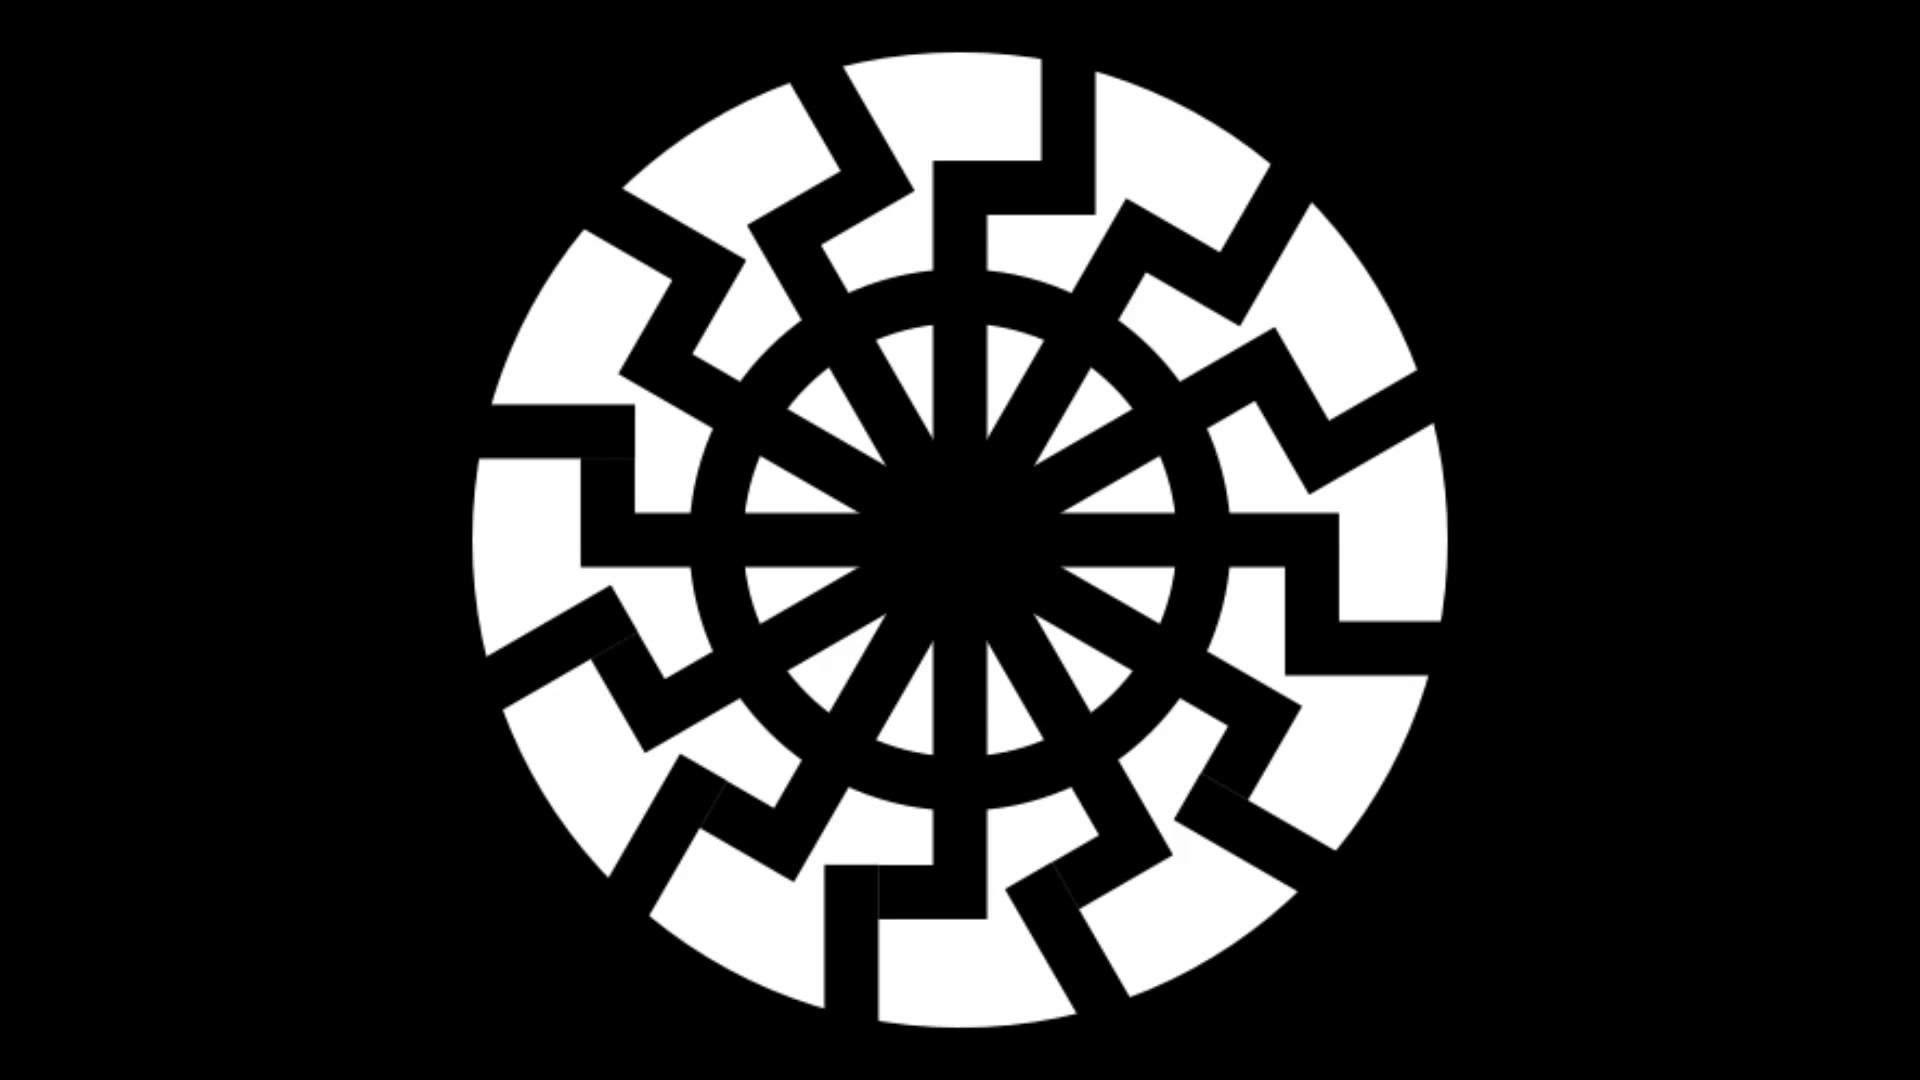 Wallpaper Black Tribal Cross Wallpapertag